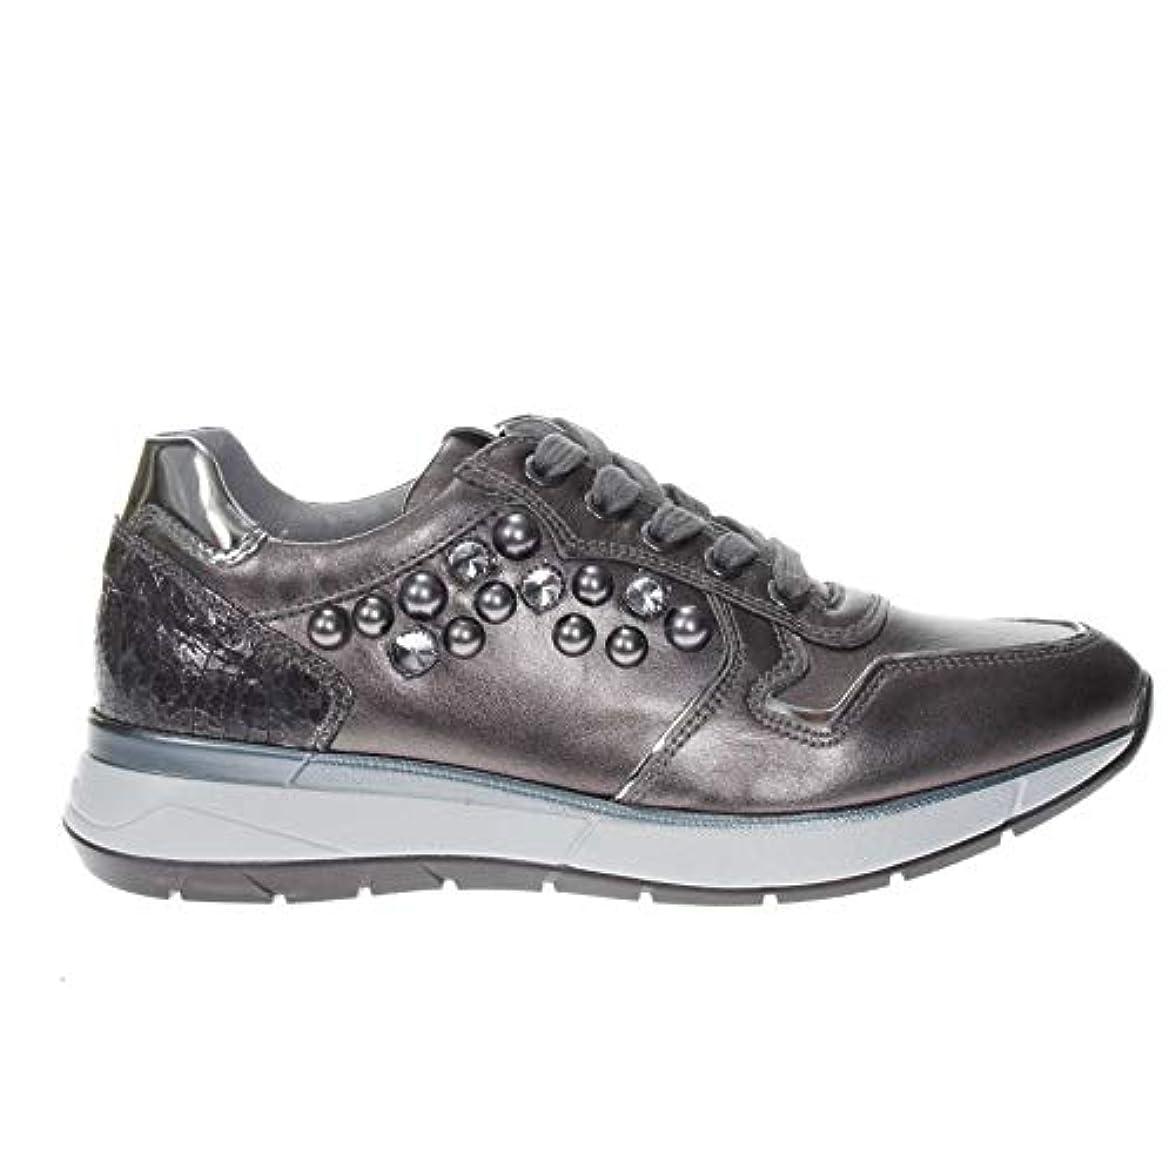 Nero Giardini Sneaker In Pelle Donna